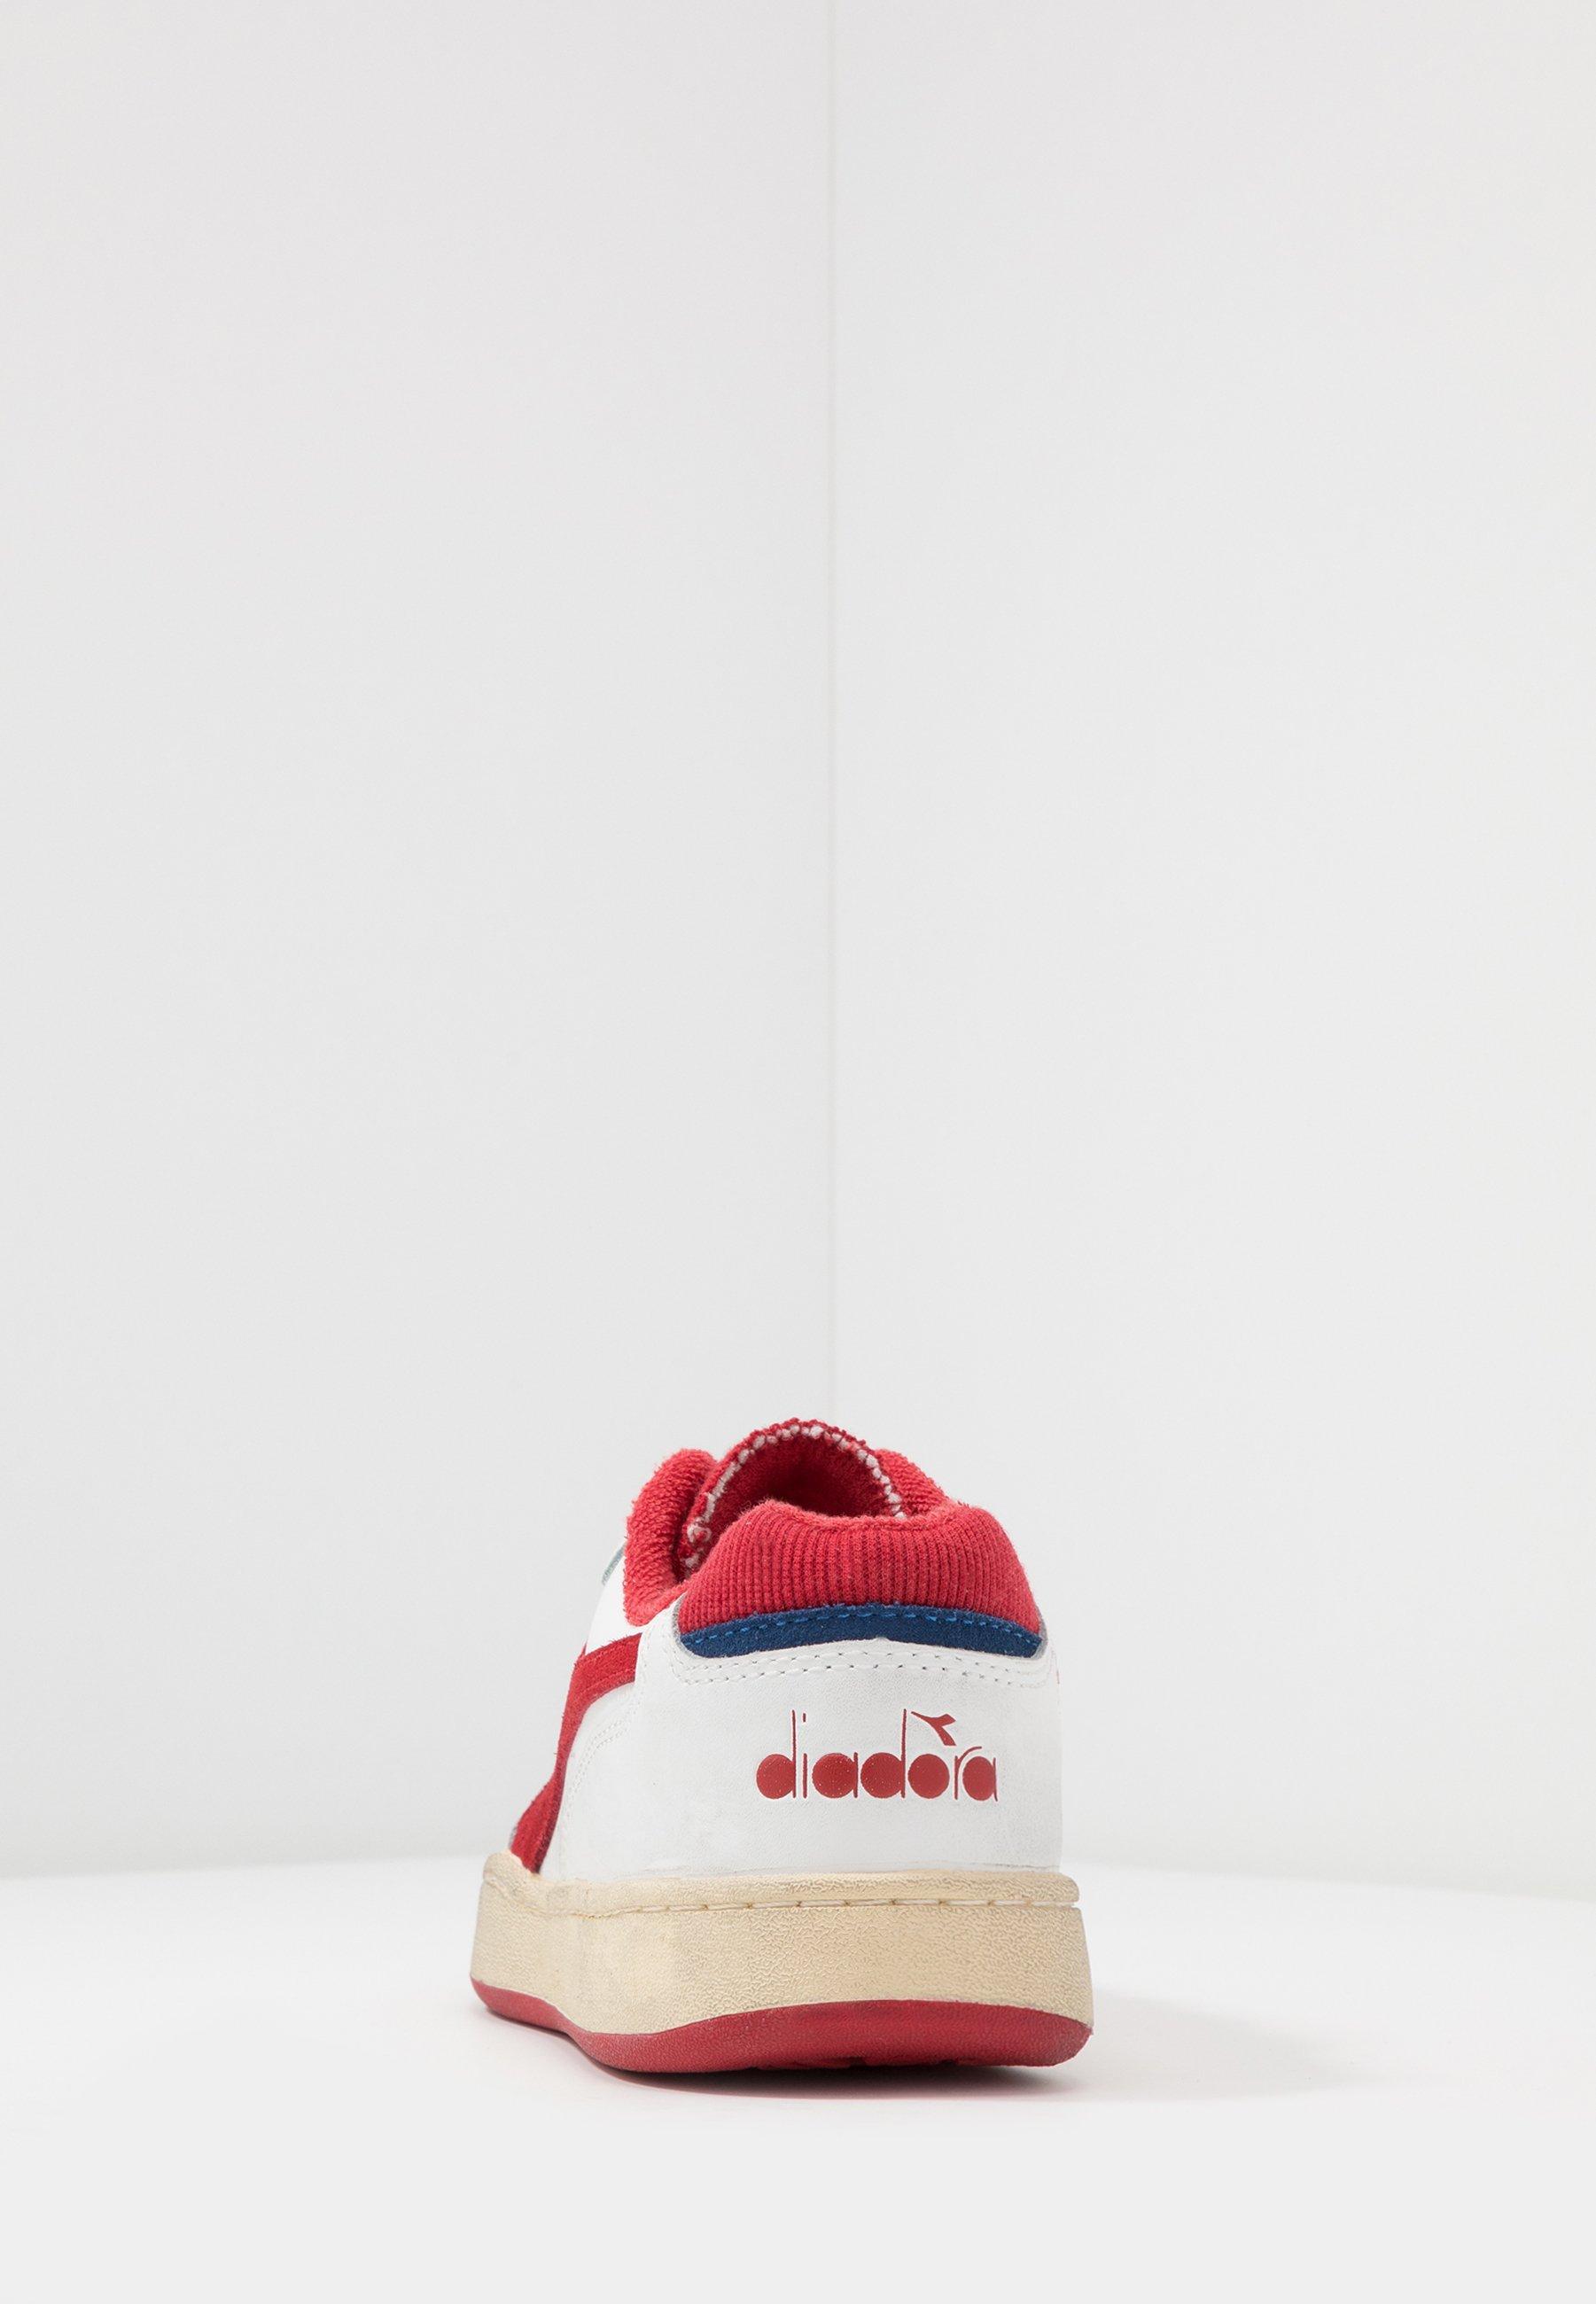 Diadora Basket Used - Sneakers Laag White/tomato Puree Goedkope Schoenen